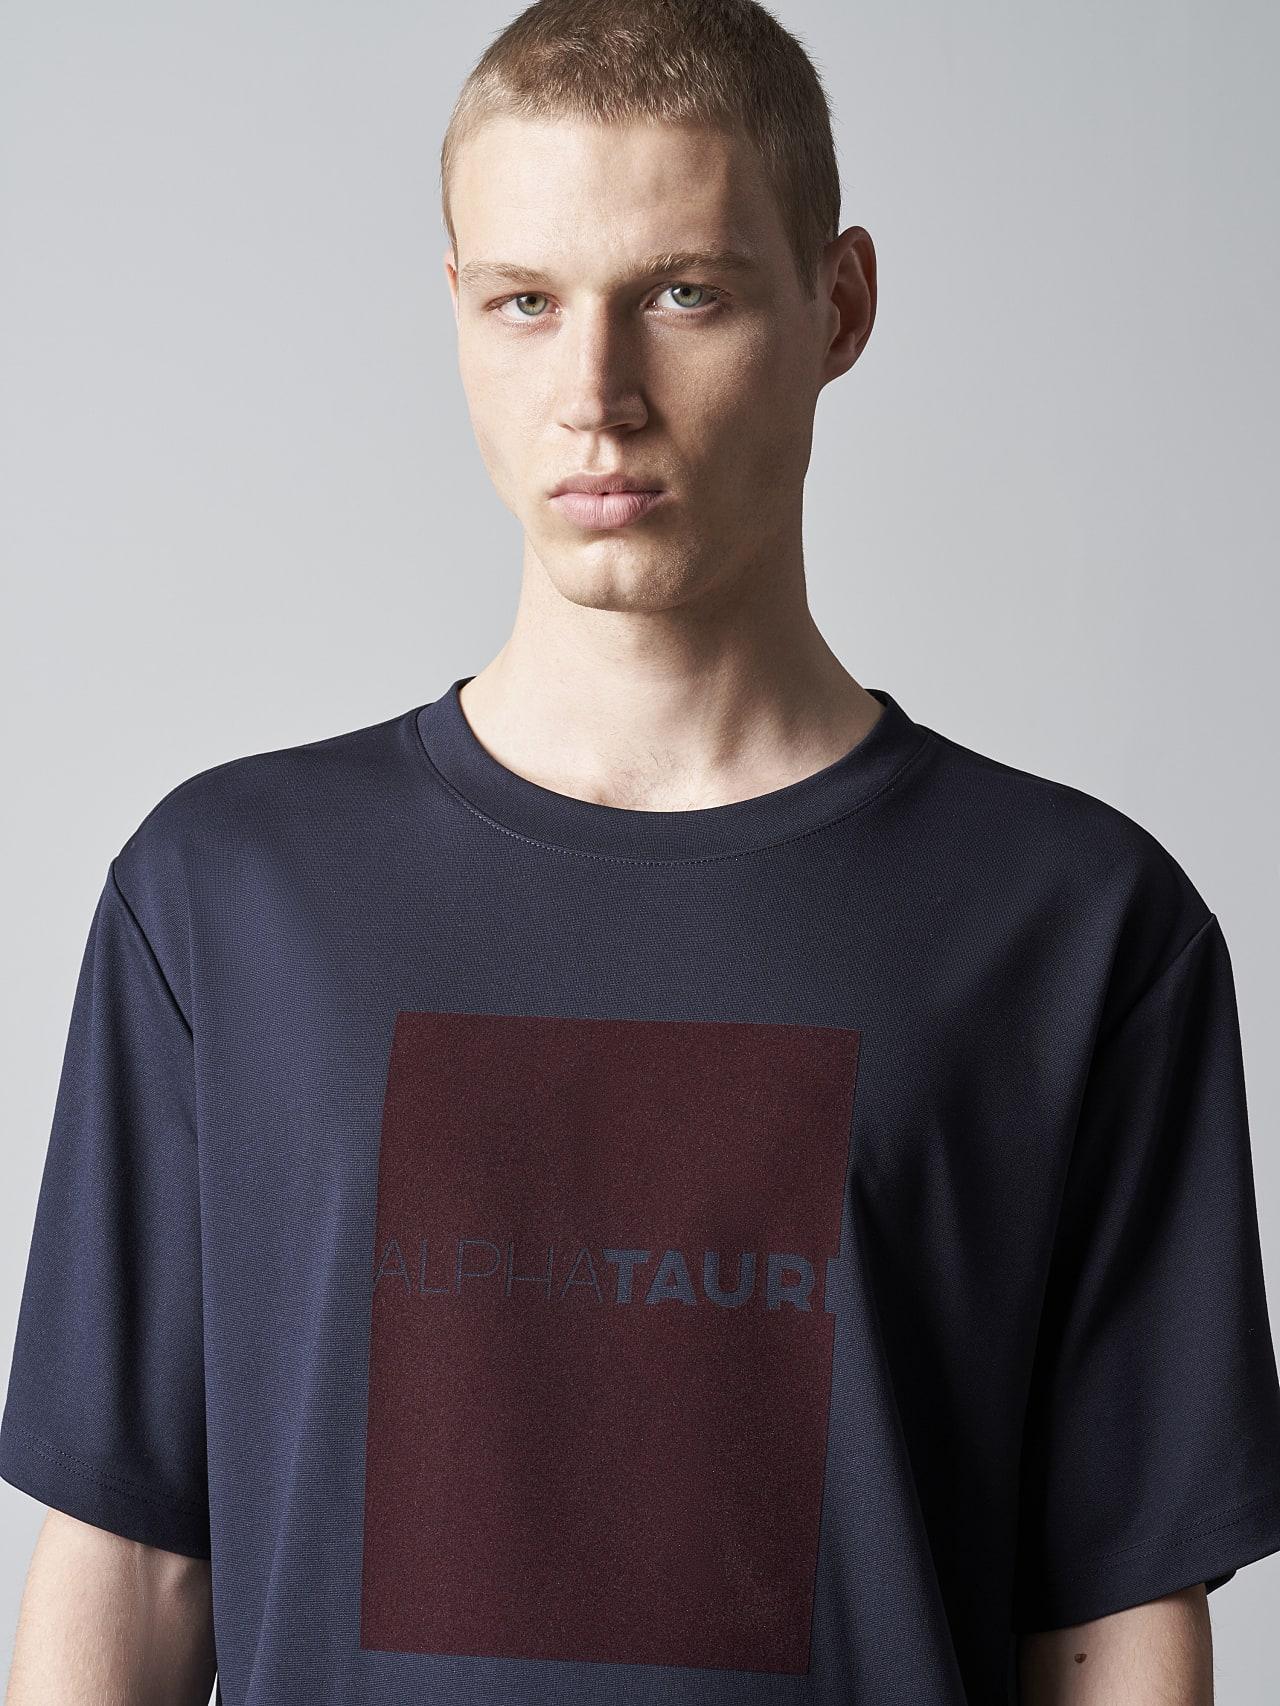 JAHEV V1.Y5.02 Relaxed Logo T-Shirt navy Right Alpha Tauri